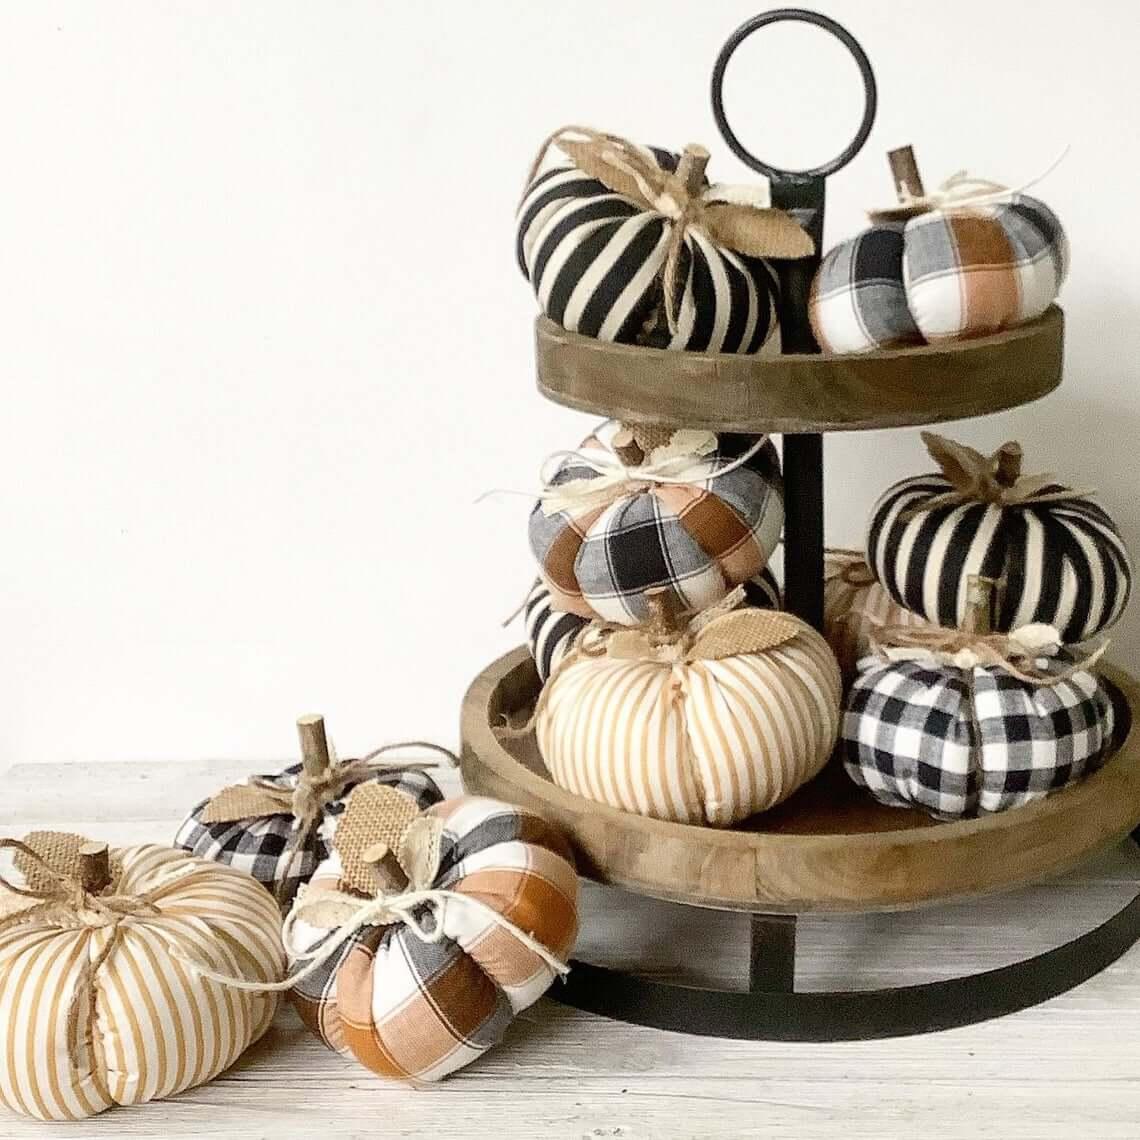 Black, White, and Butterscotch Pumpkins